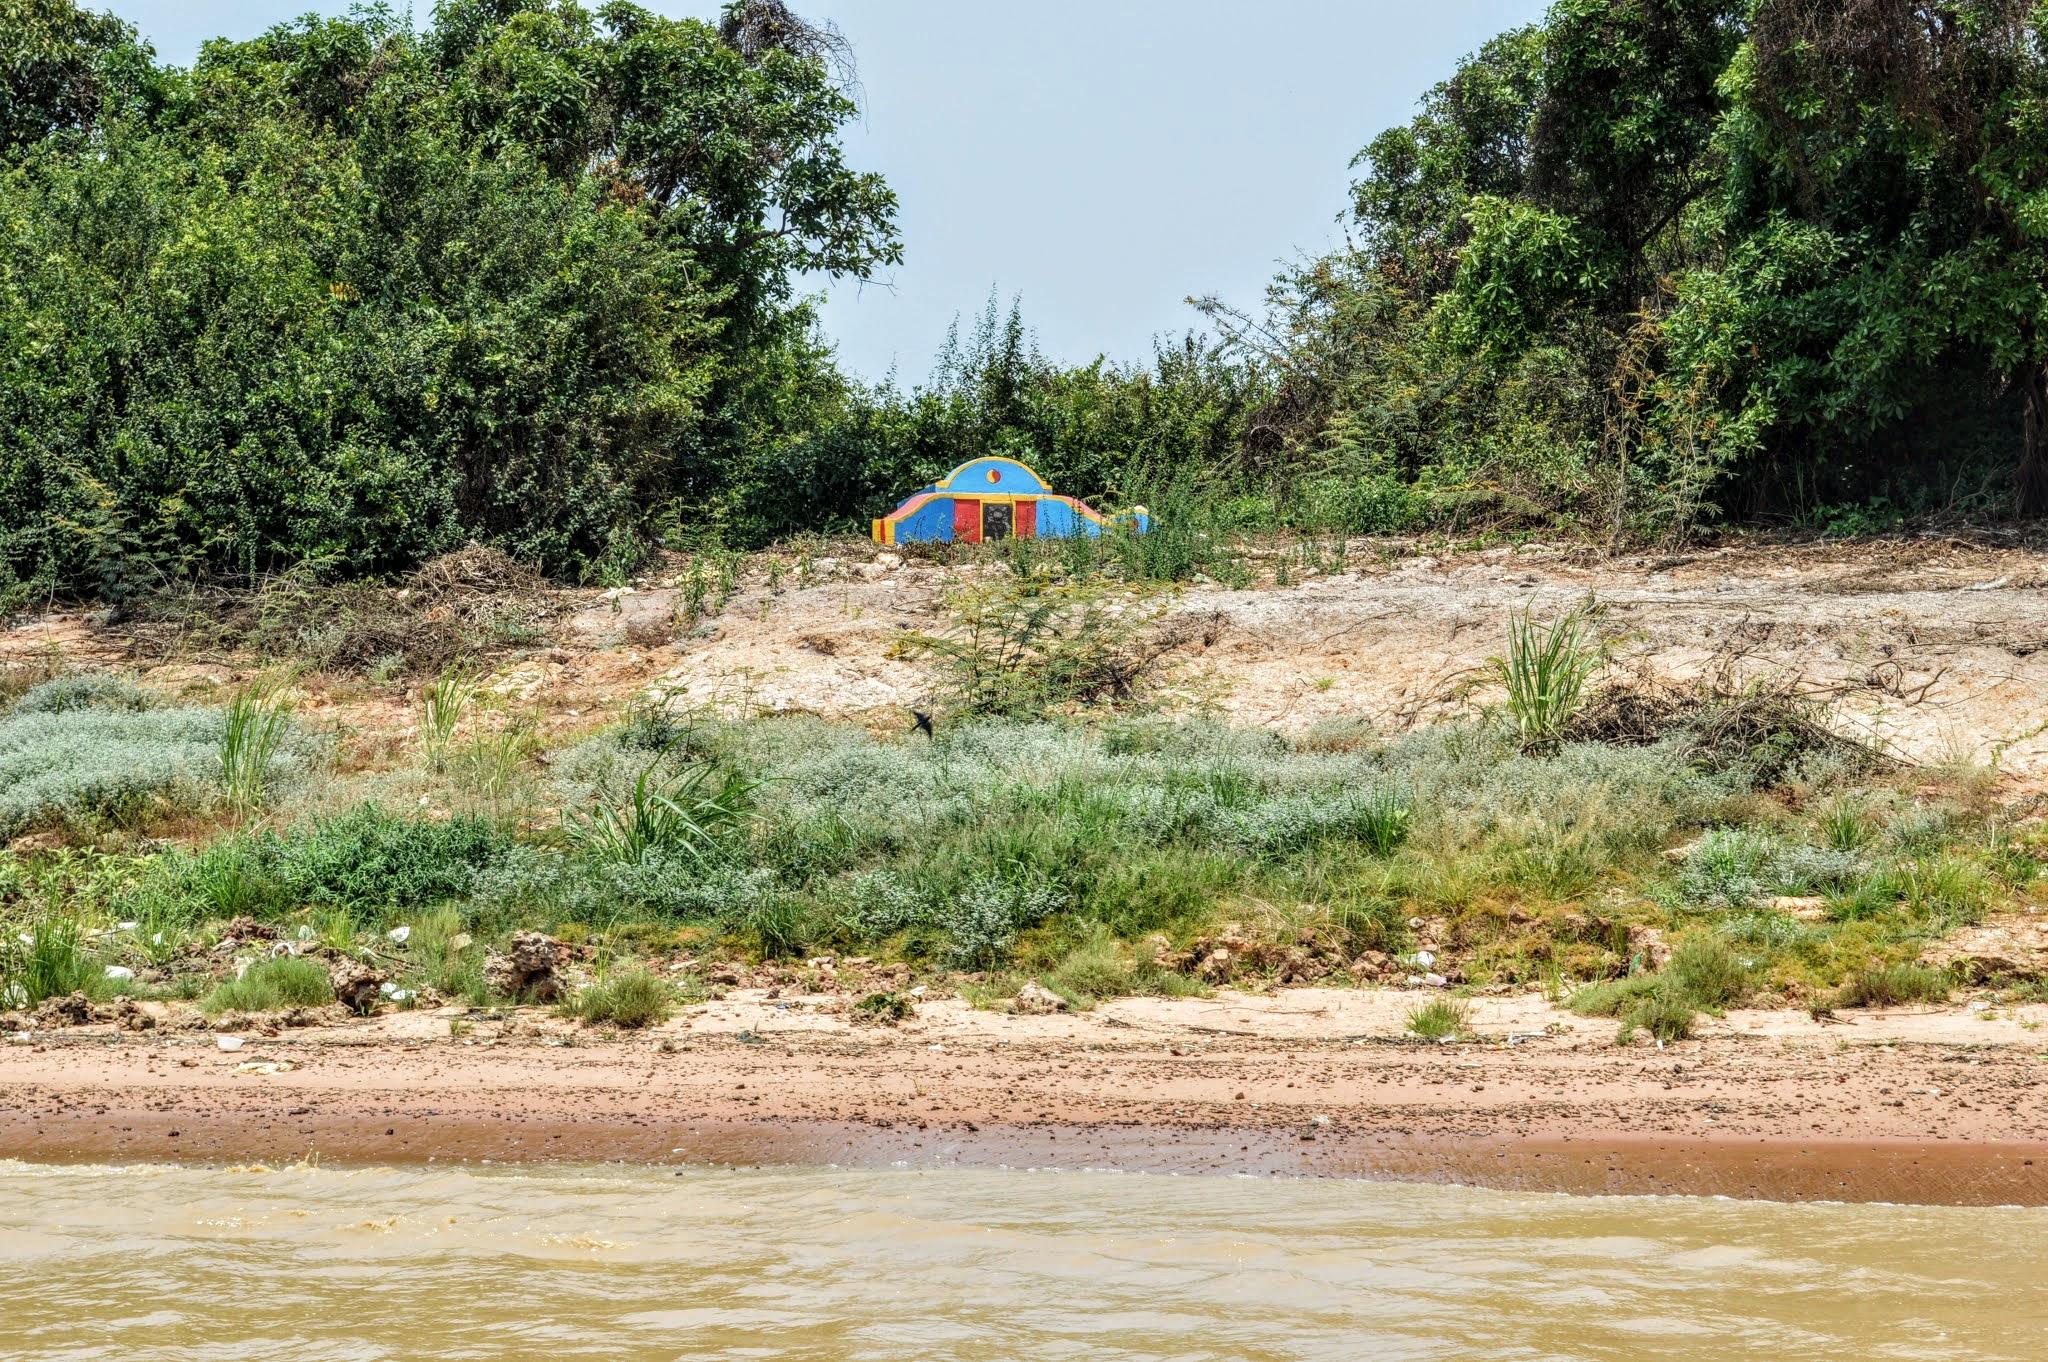 Floating Villages Of Tonle Sap Lake Amp Why Giant Ibis Rocks